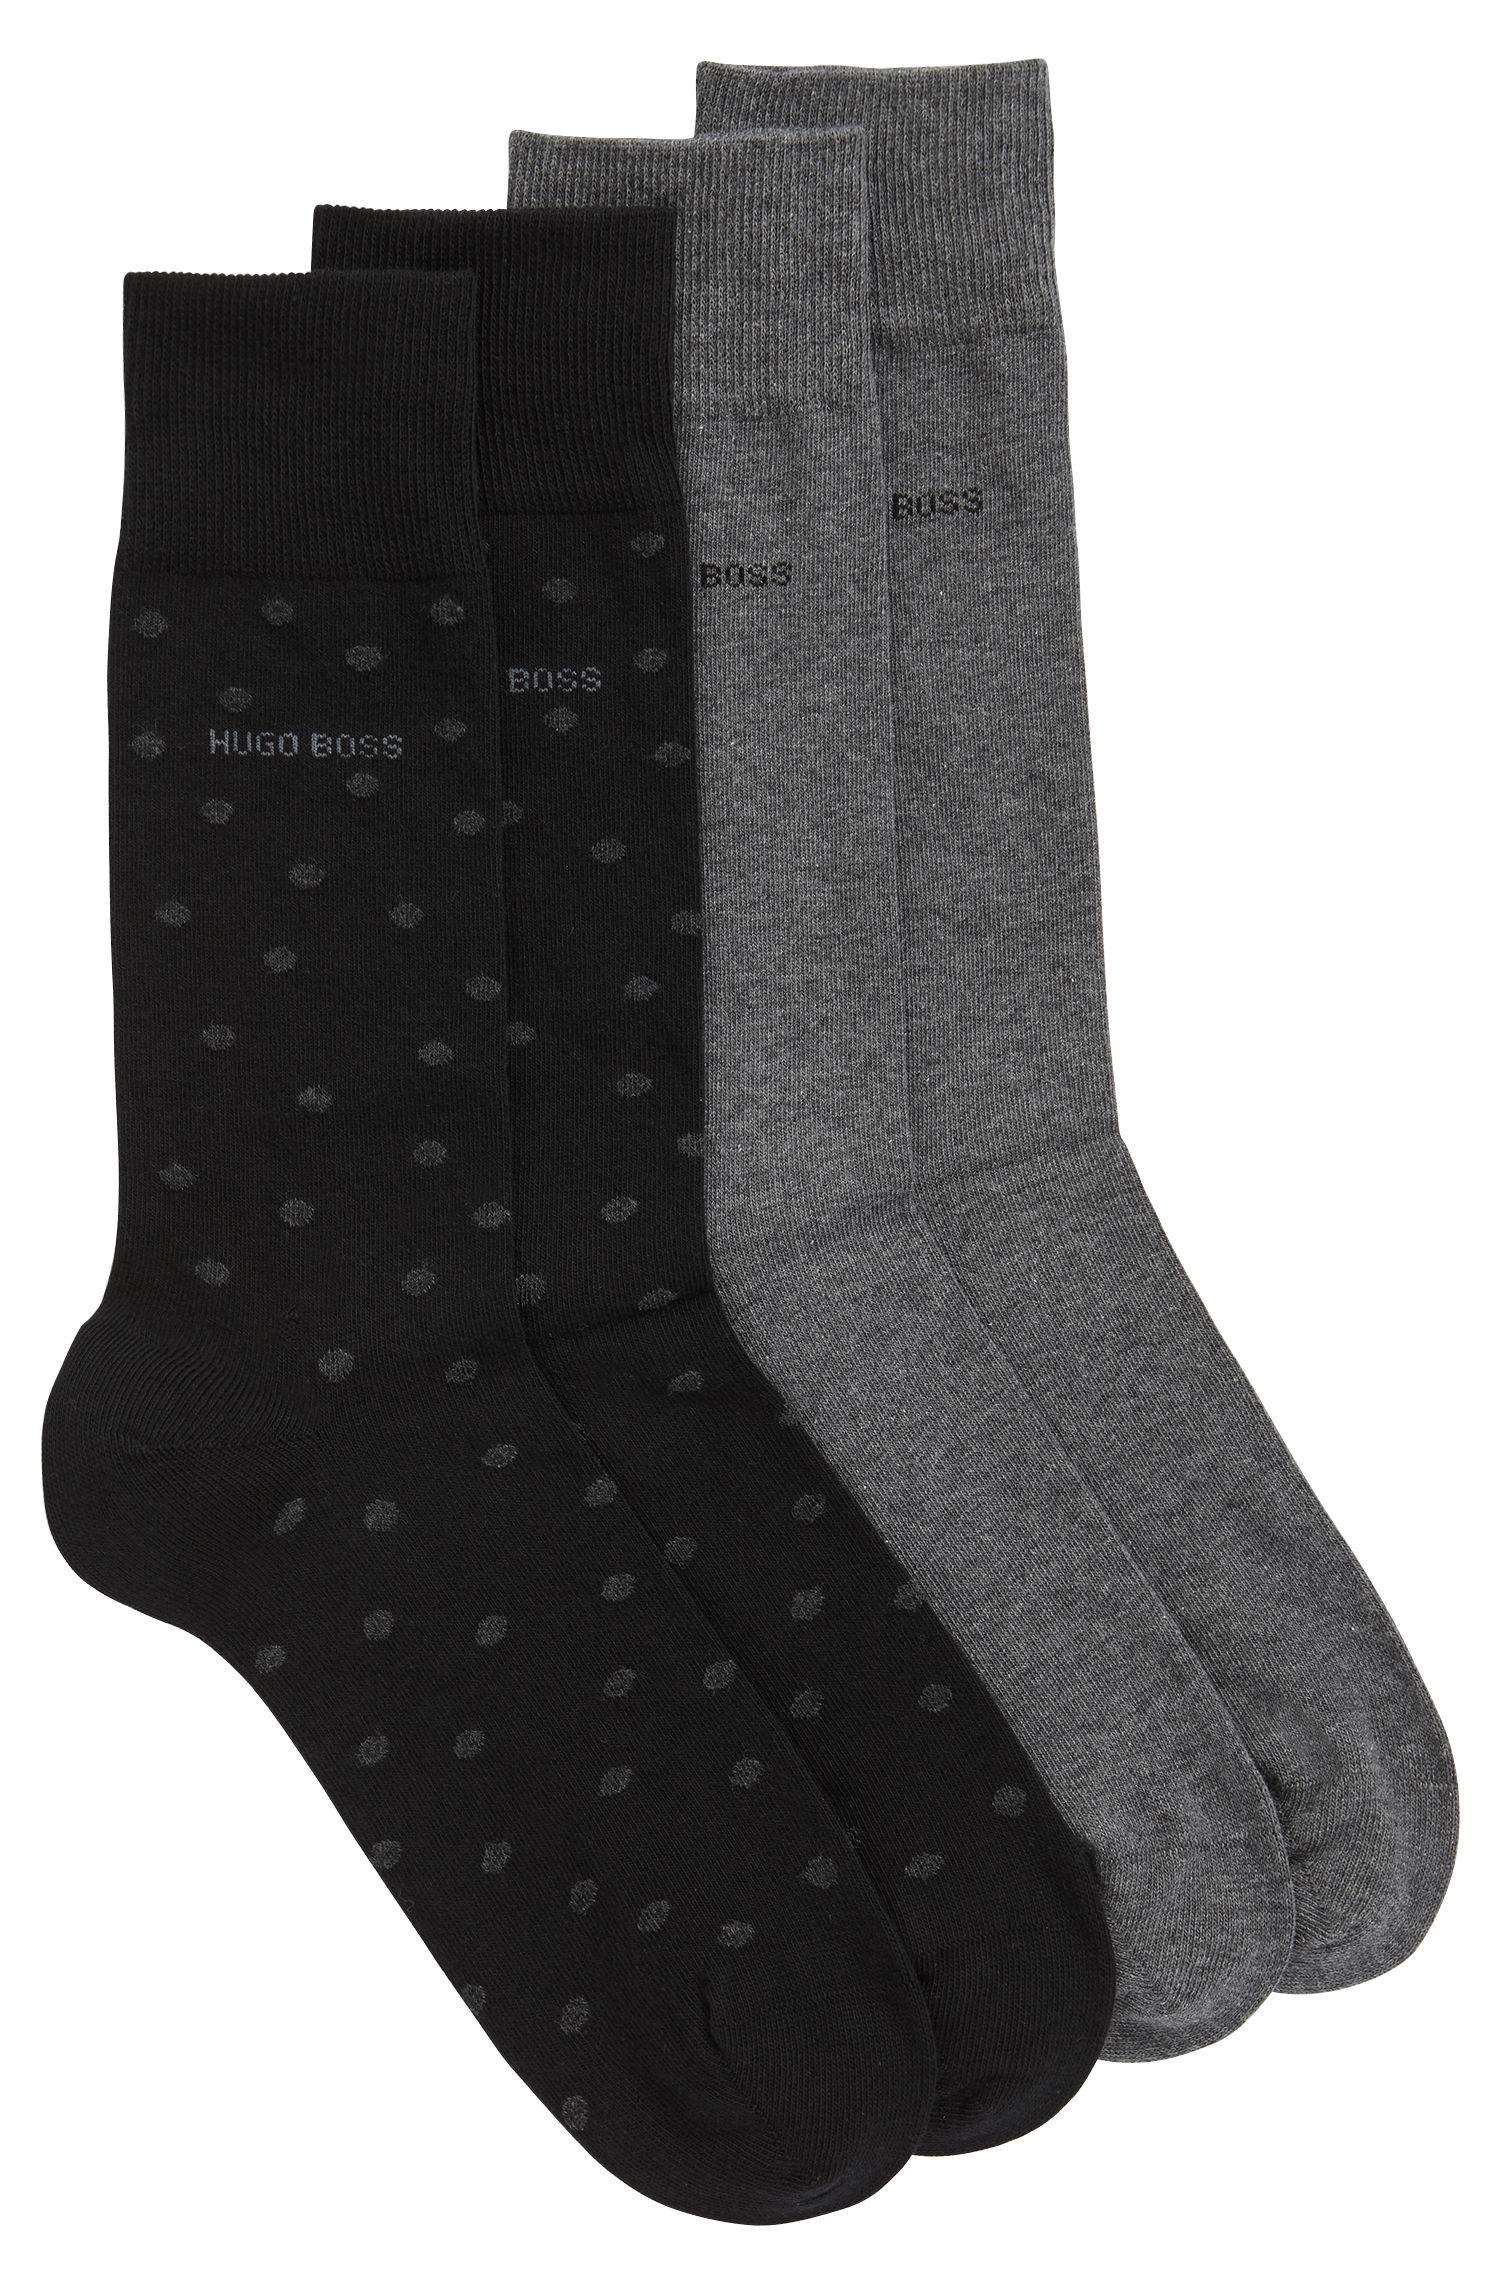 Two-pack of regular-length socks in a cotton blend, Black